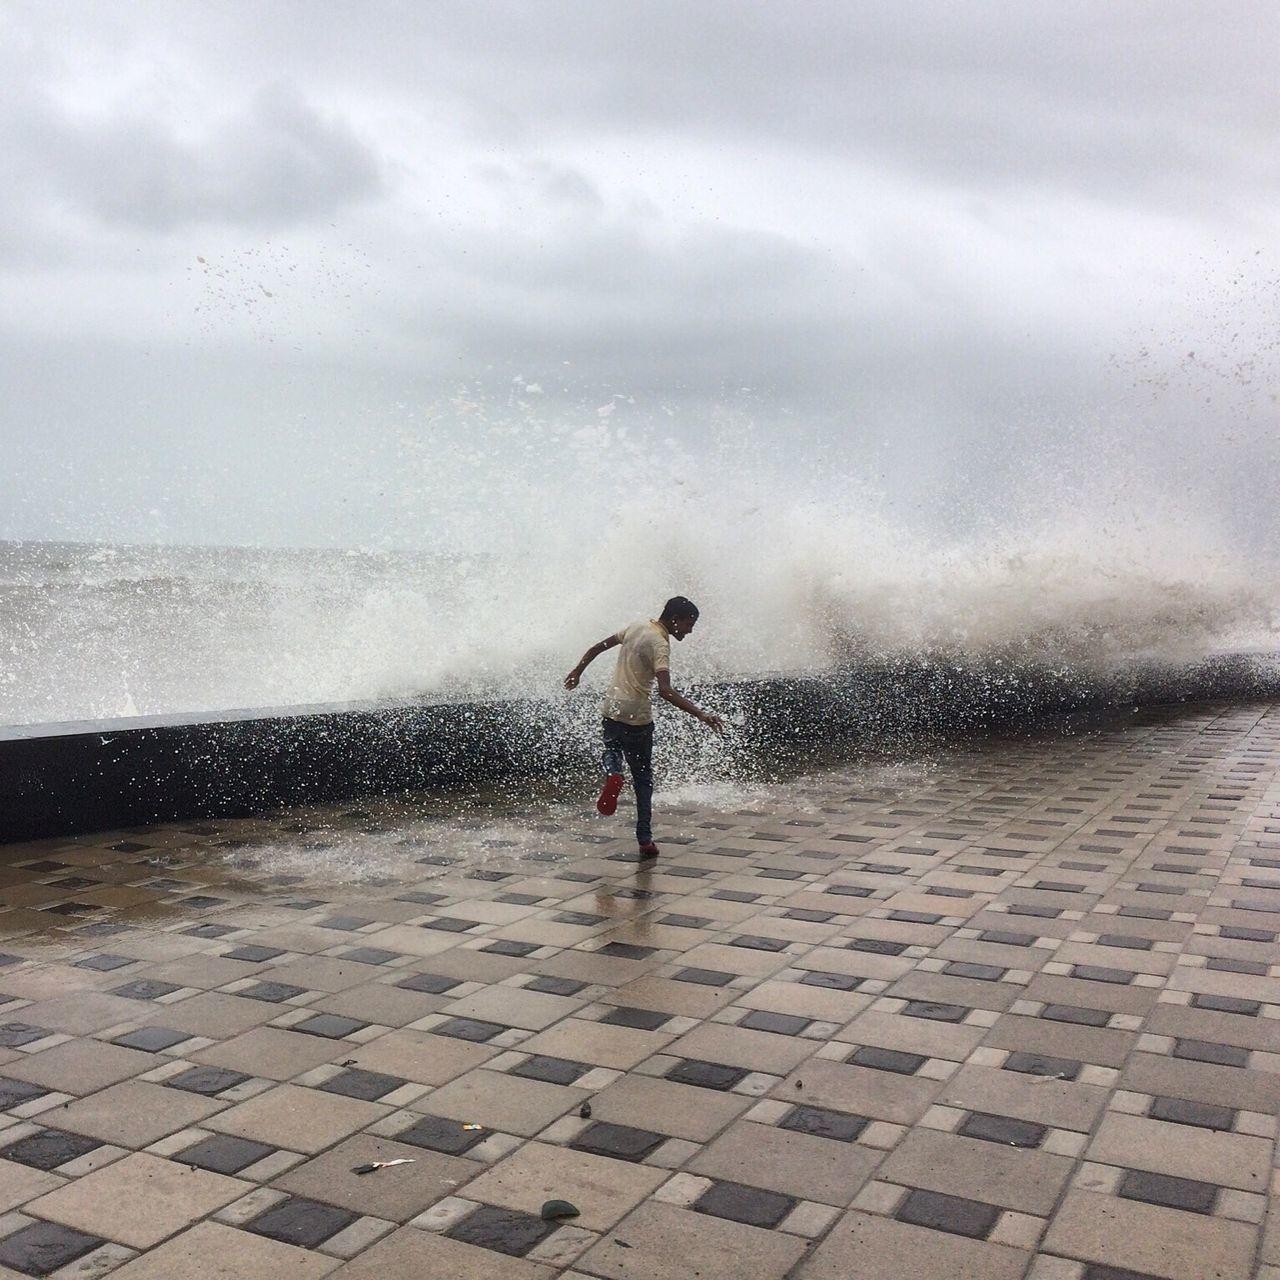 Rear view of boy enjoying by waves splashing at promenade against cloudy sky